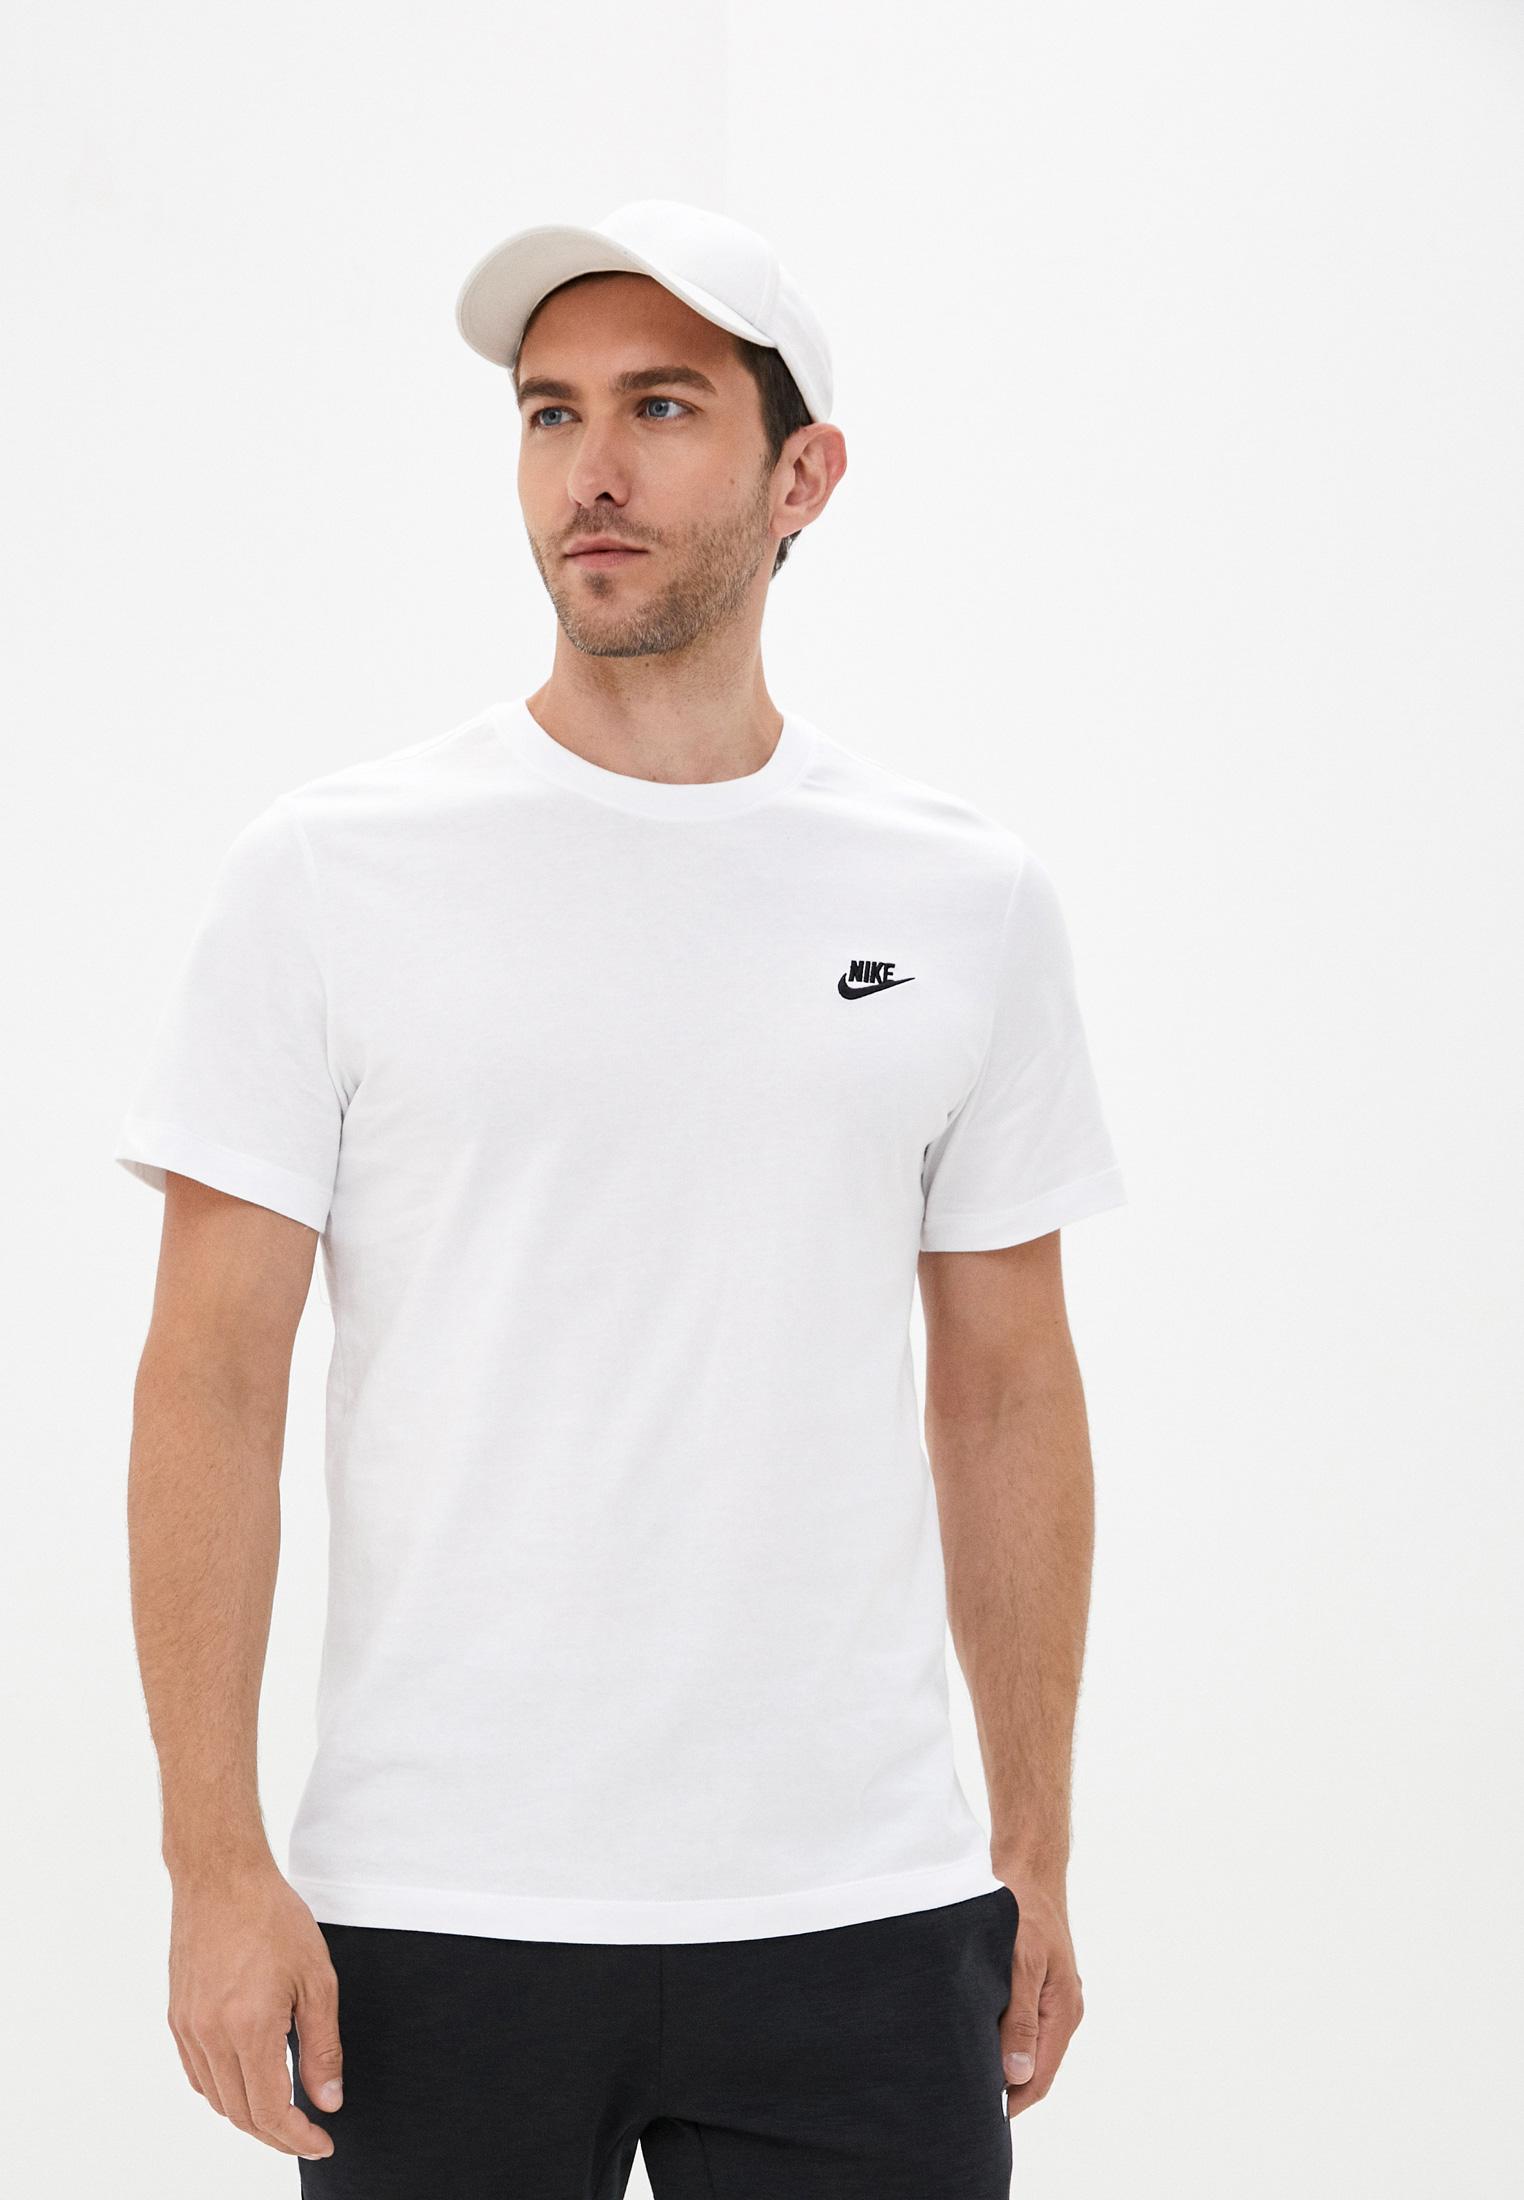 Nike Футболка SPORTSWEAR CLUB MEN'S T-SHIRT